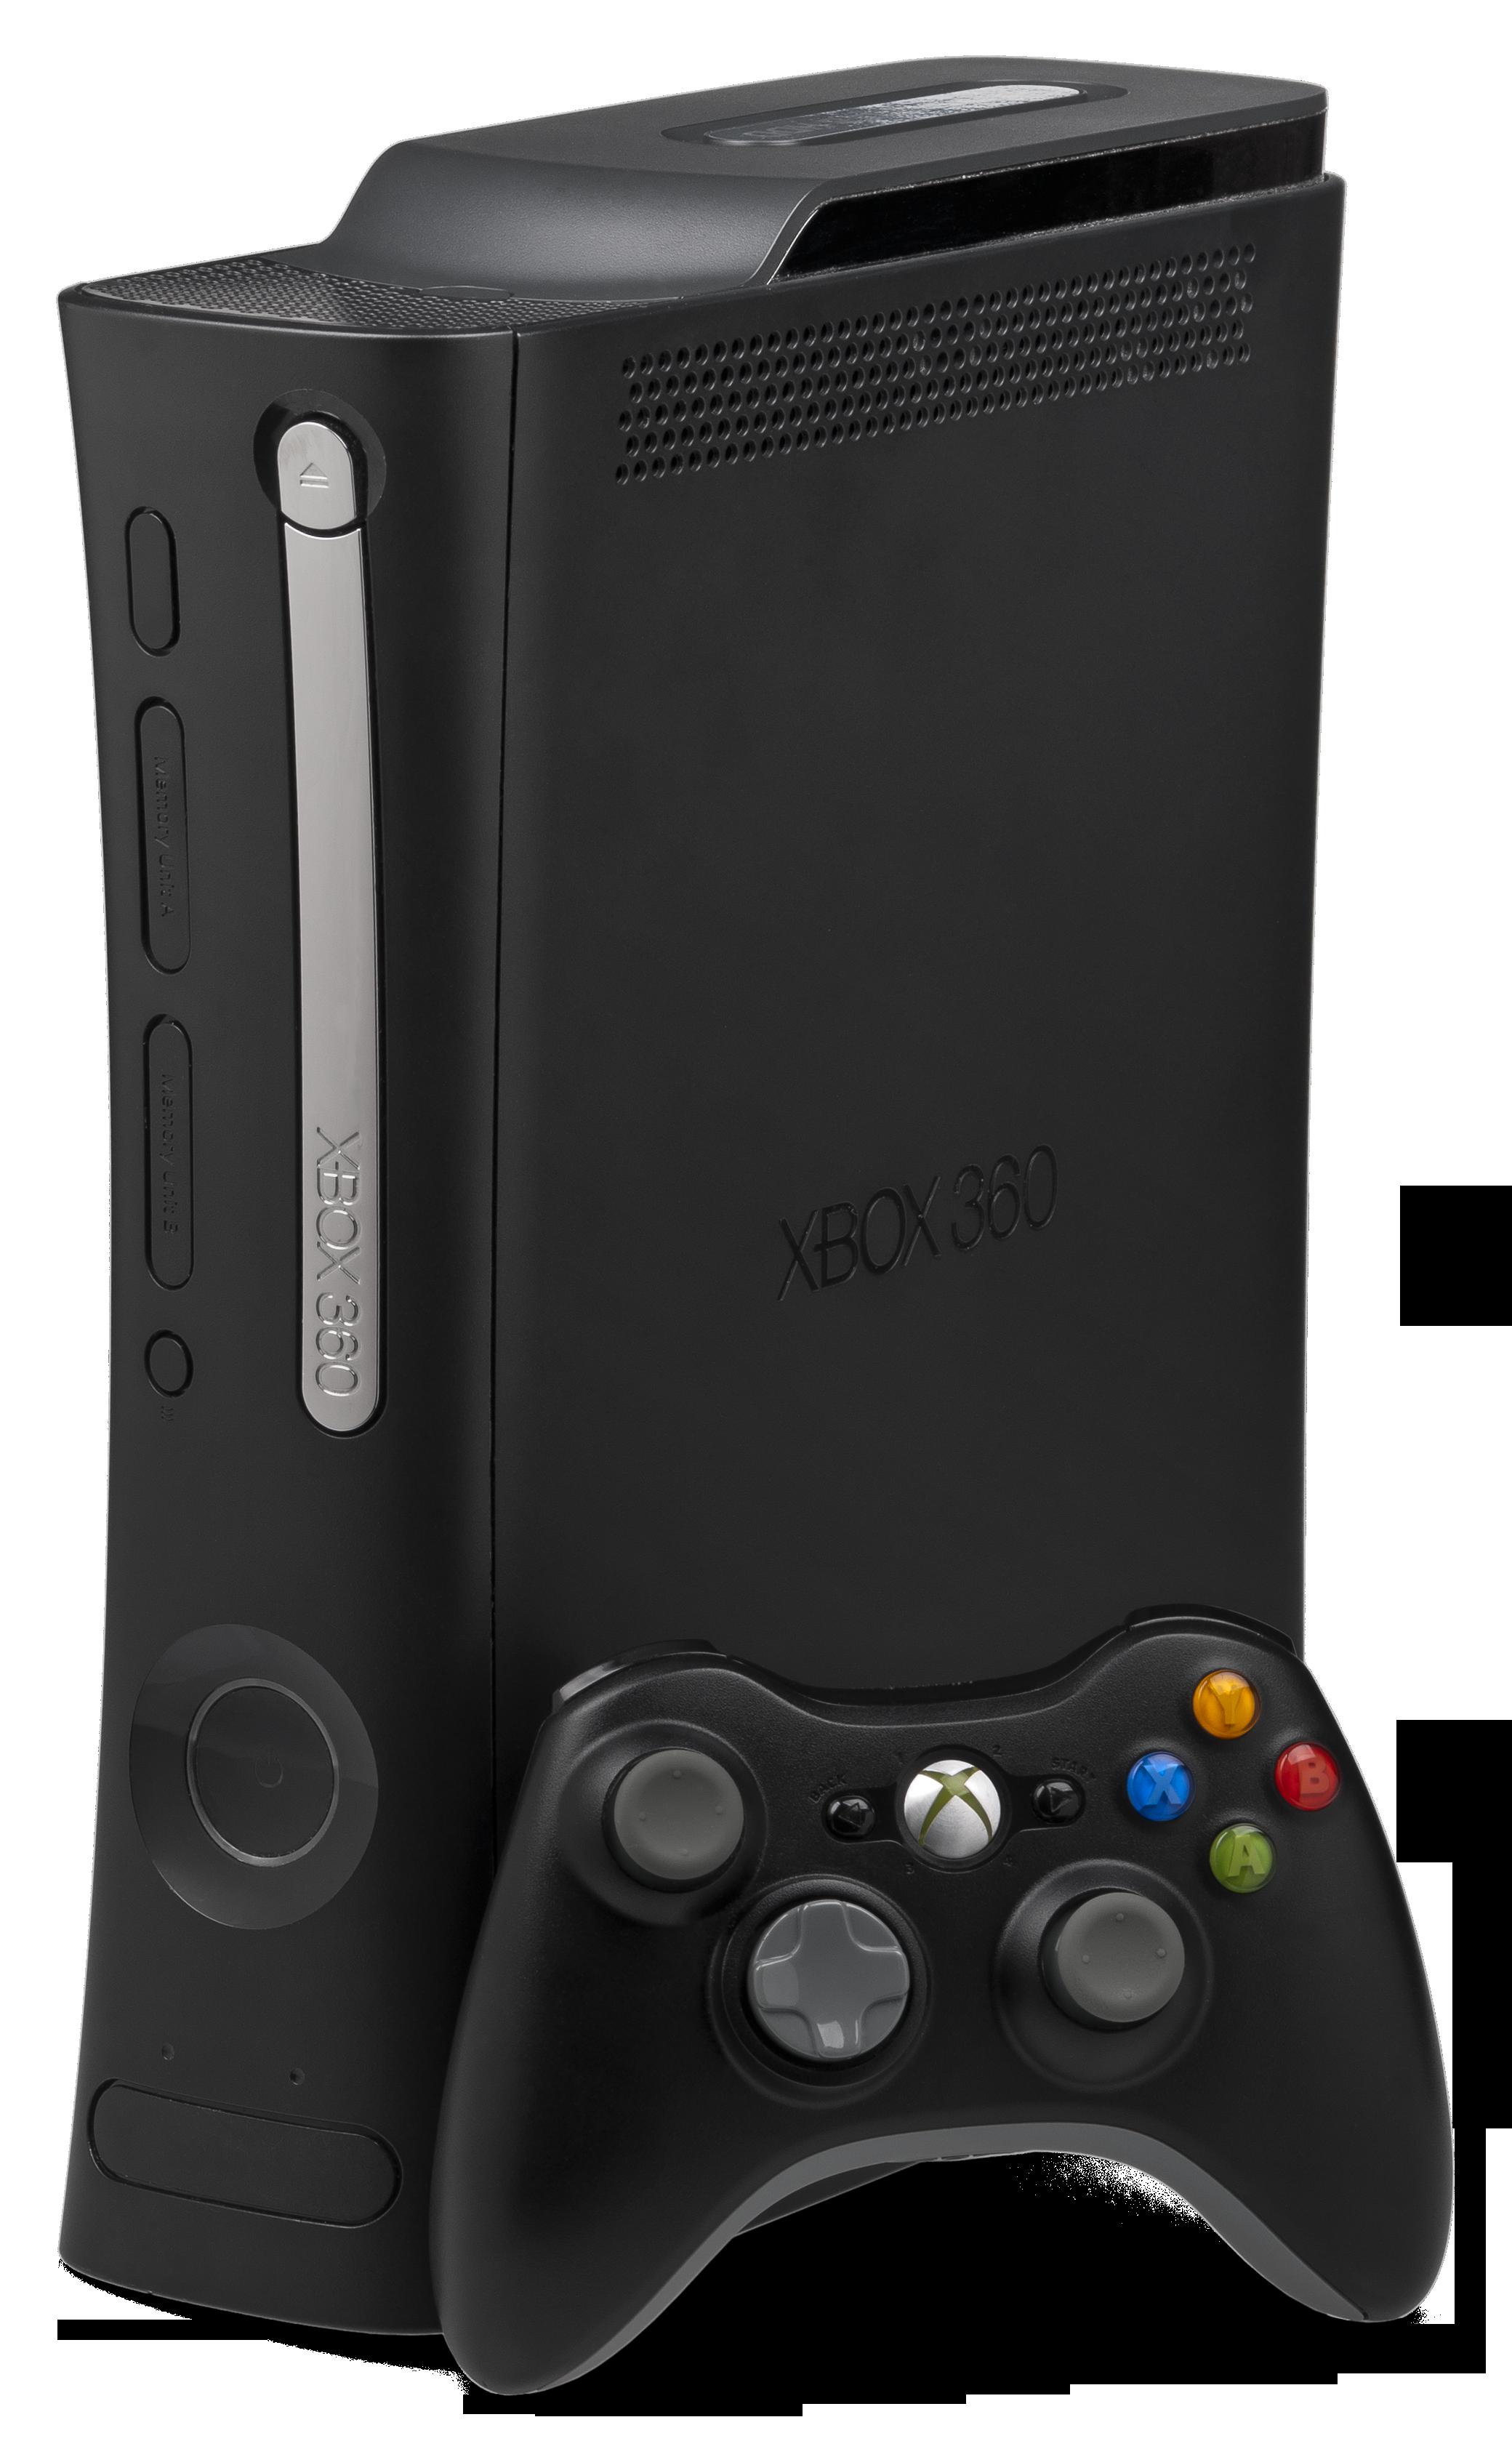 Xbox slim png